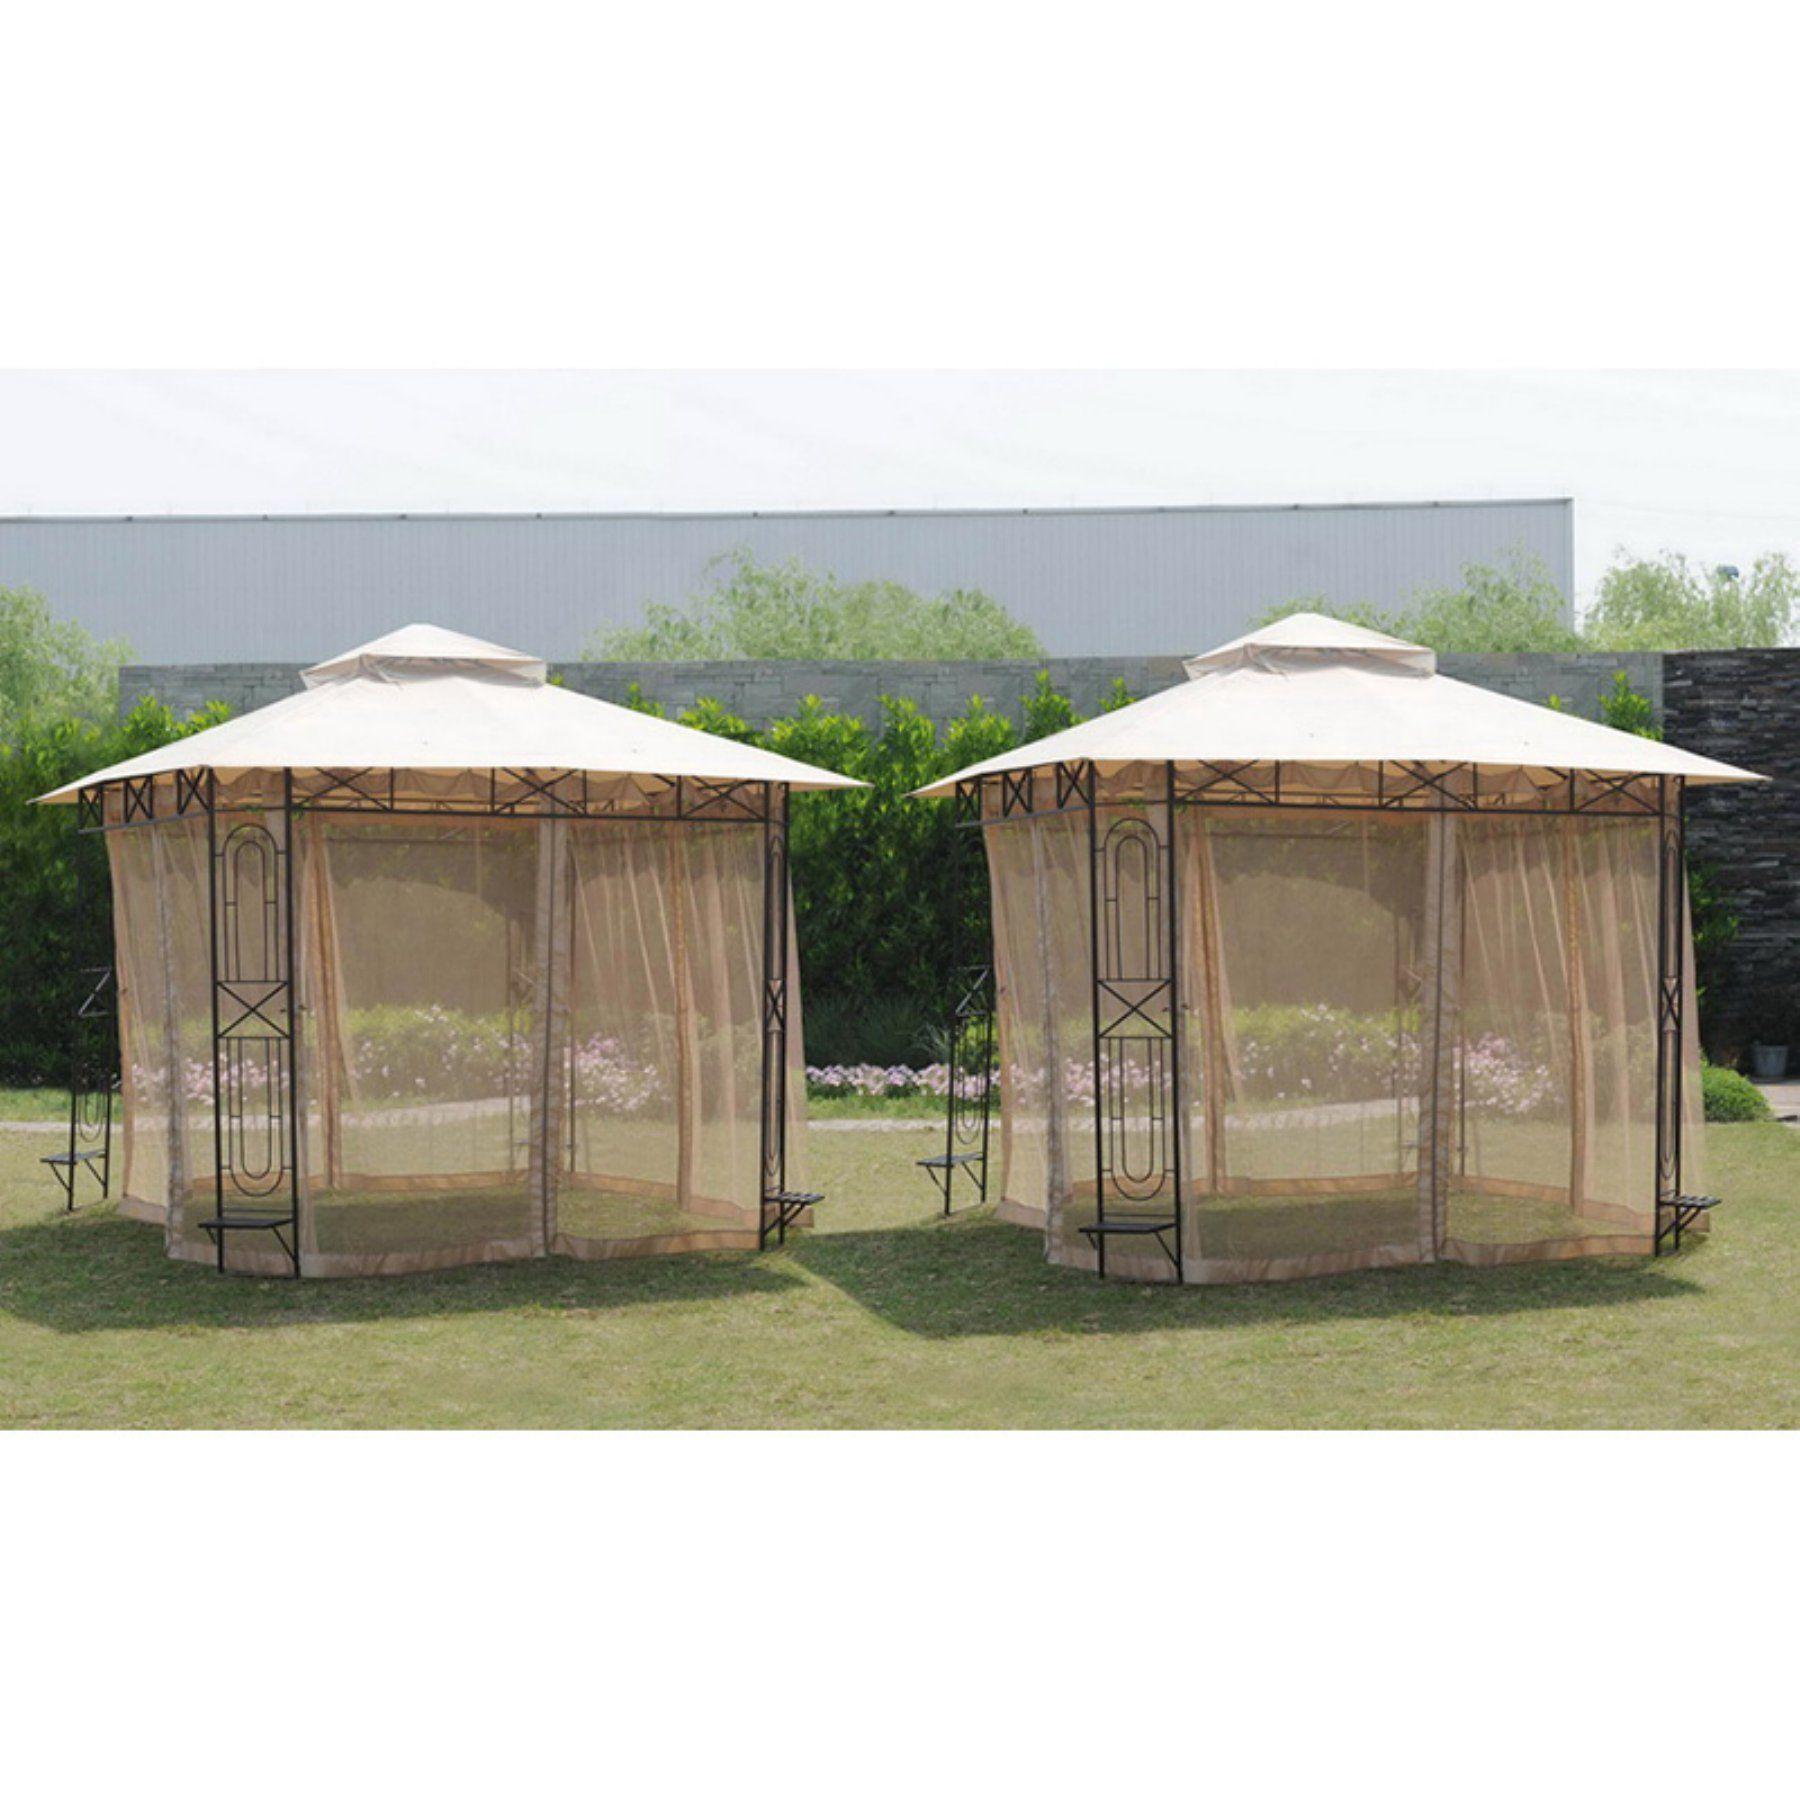 Sunjoy Replacement Mosquito Netting For 10 X 10 Ft Gazebo 110109557 Gazebo